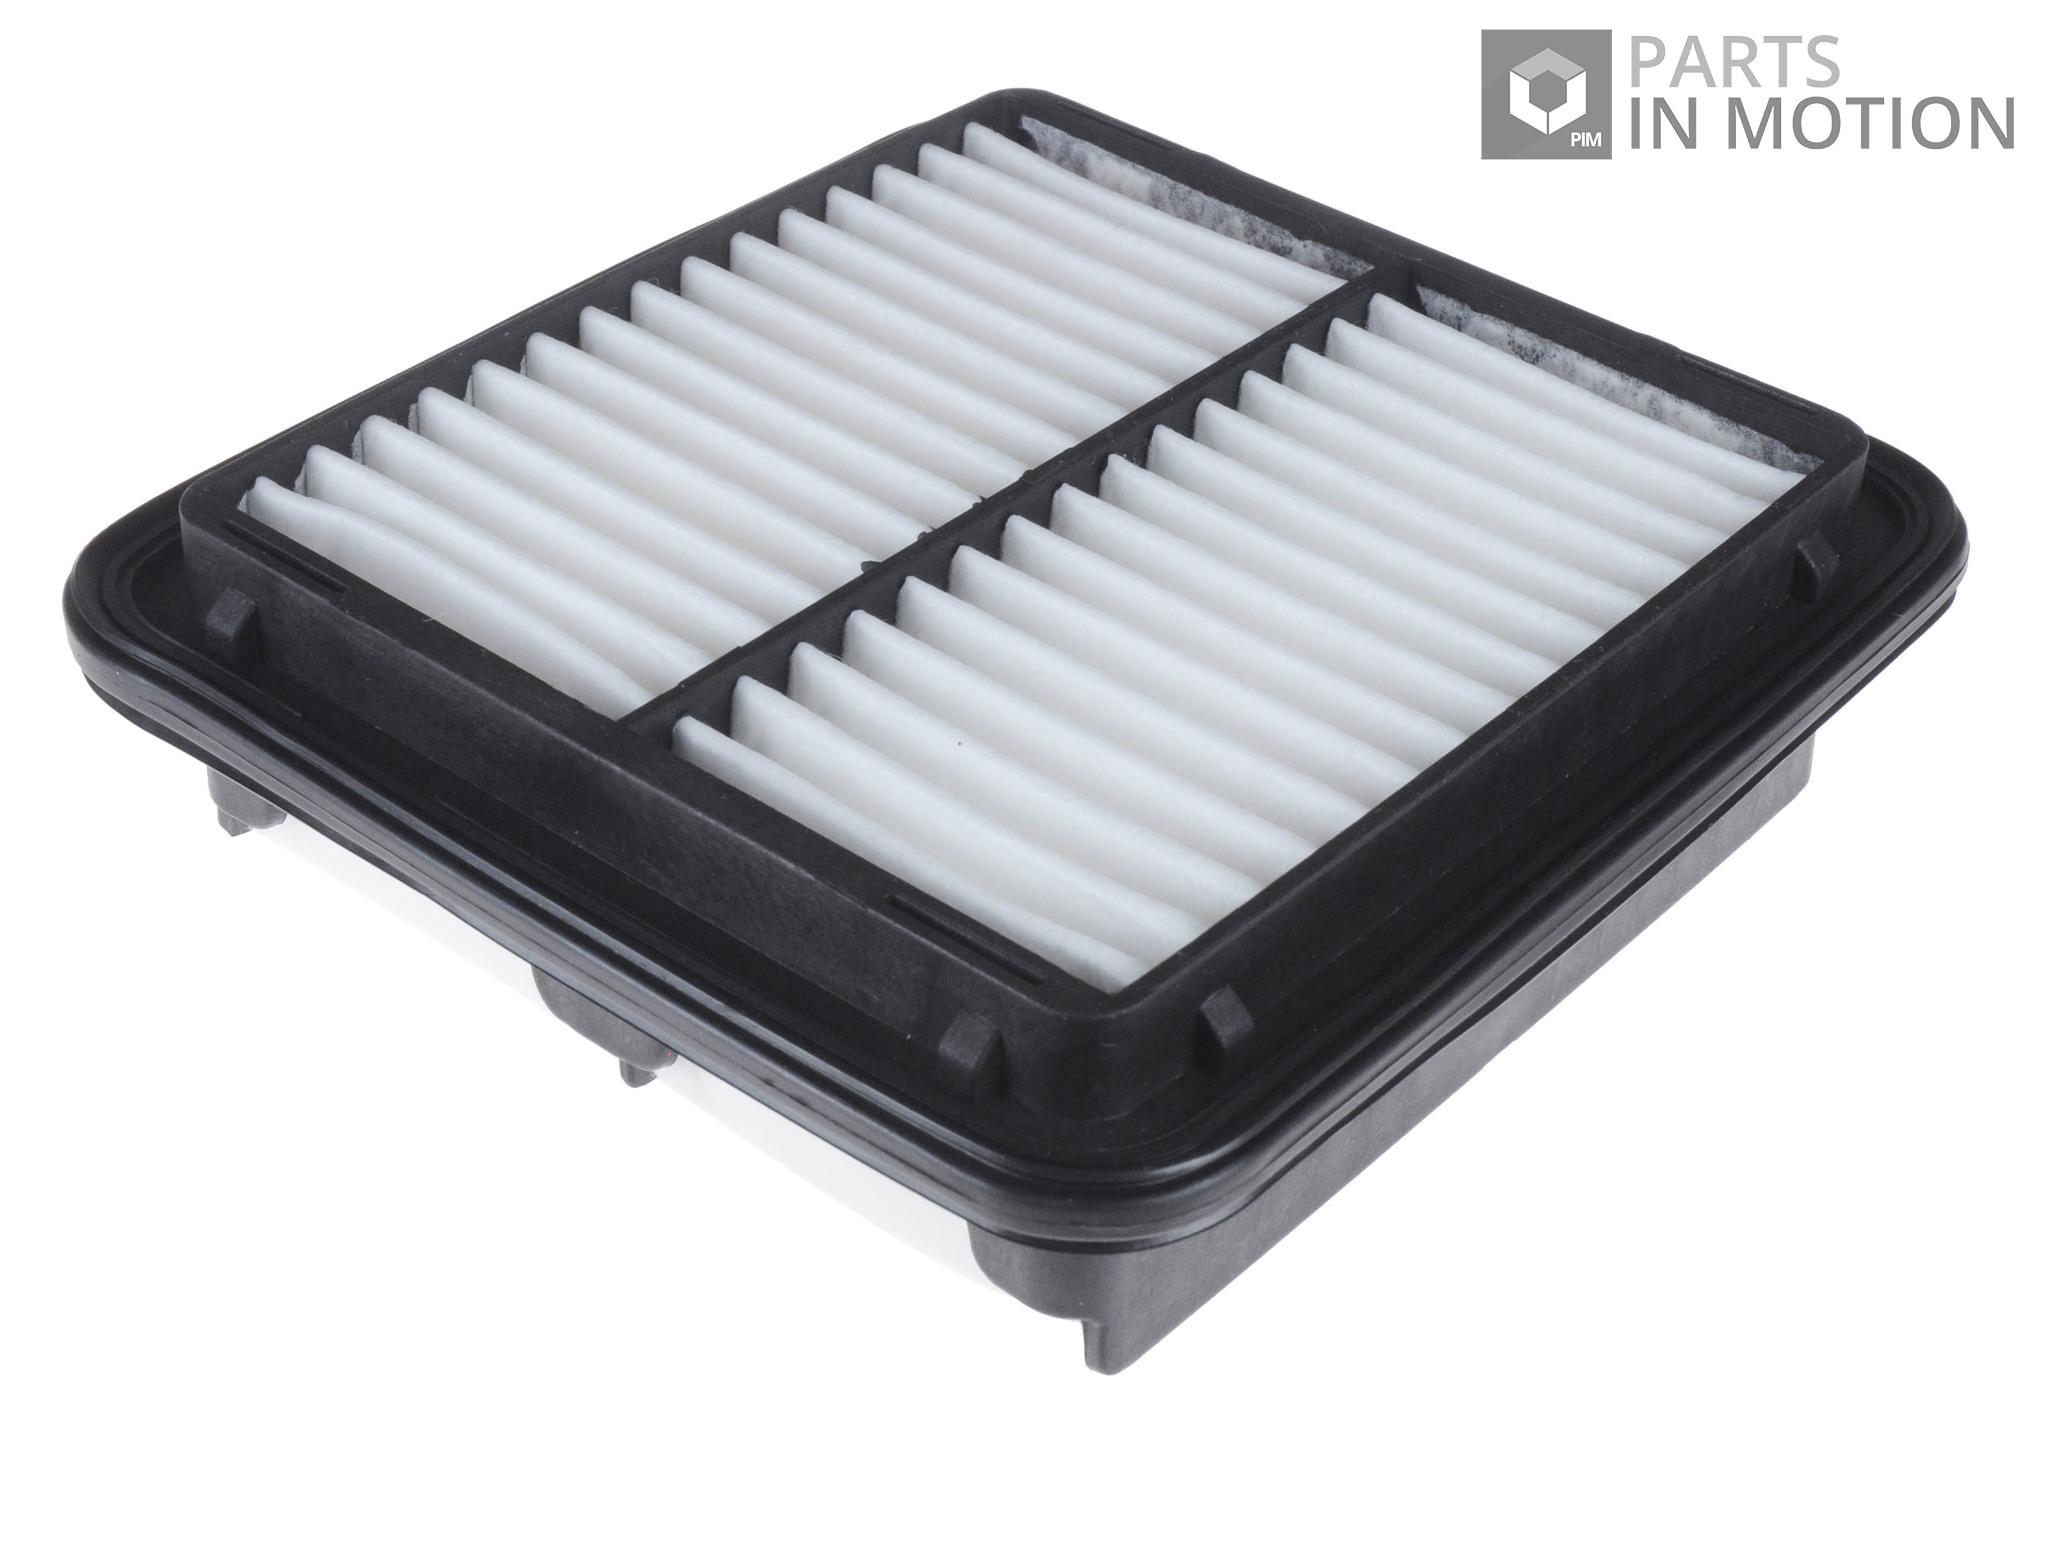 Air Filter Fits Daihatsu Sirion 13 00 To 05 Adl 1780197201000 Ac Blue Print Add62217